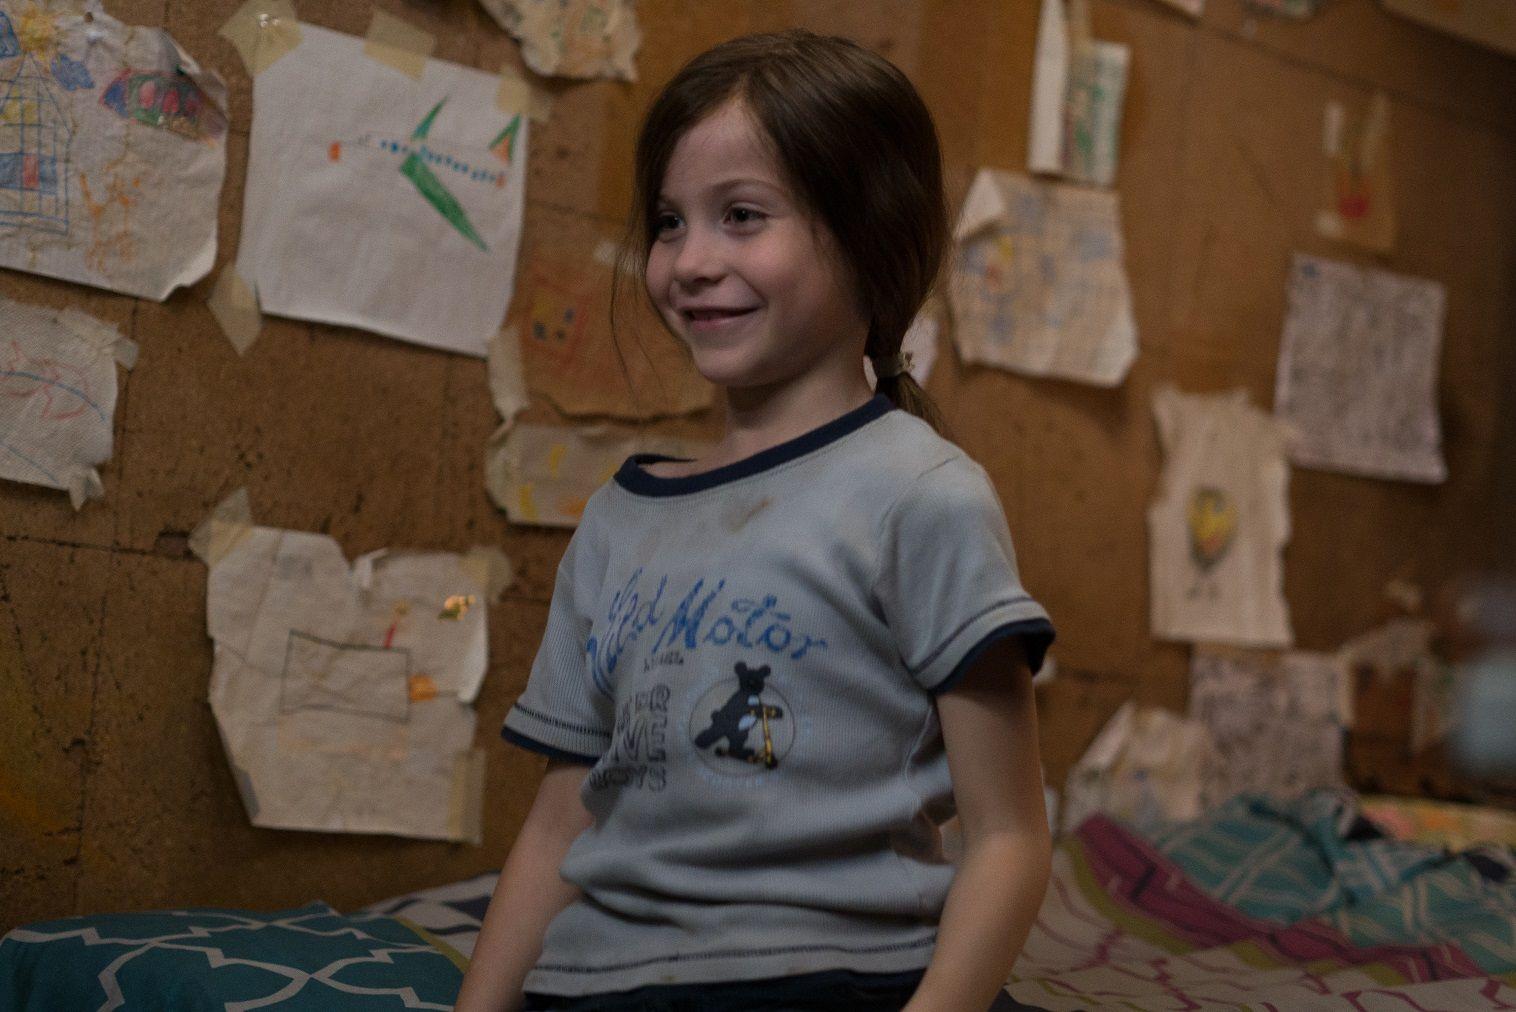 Room (2015) movie Screenshot